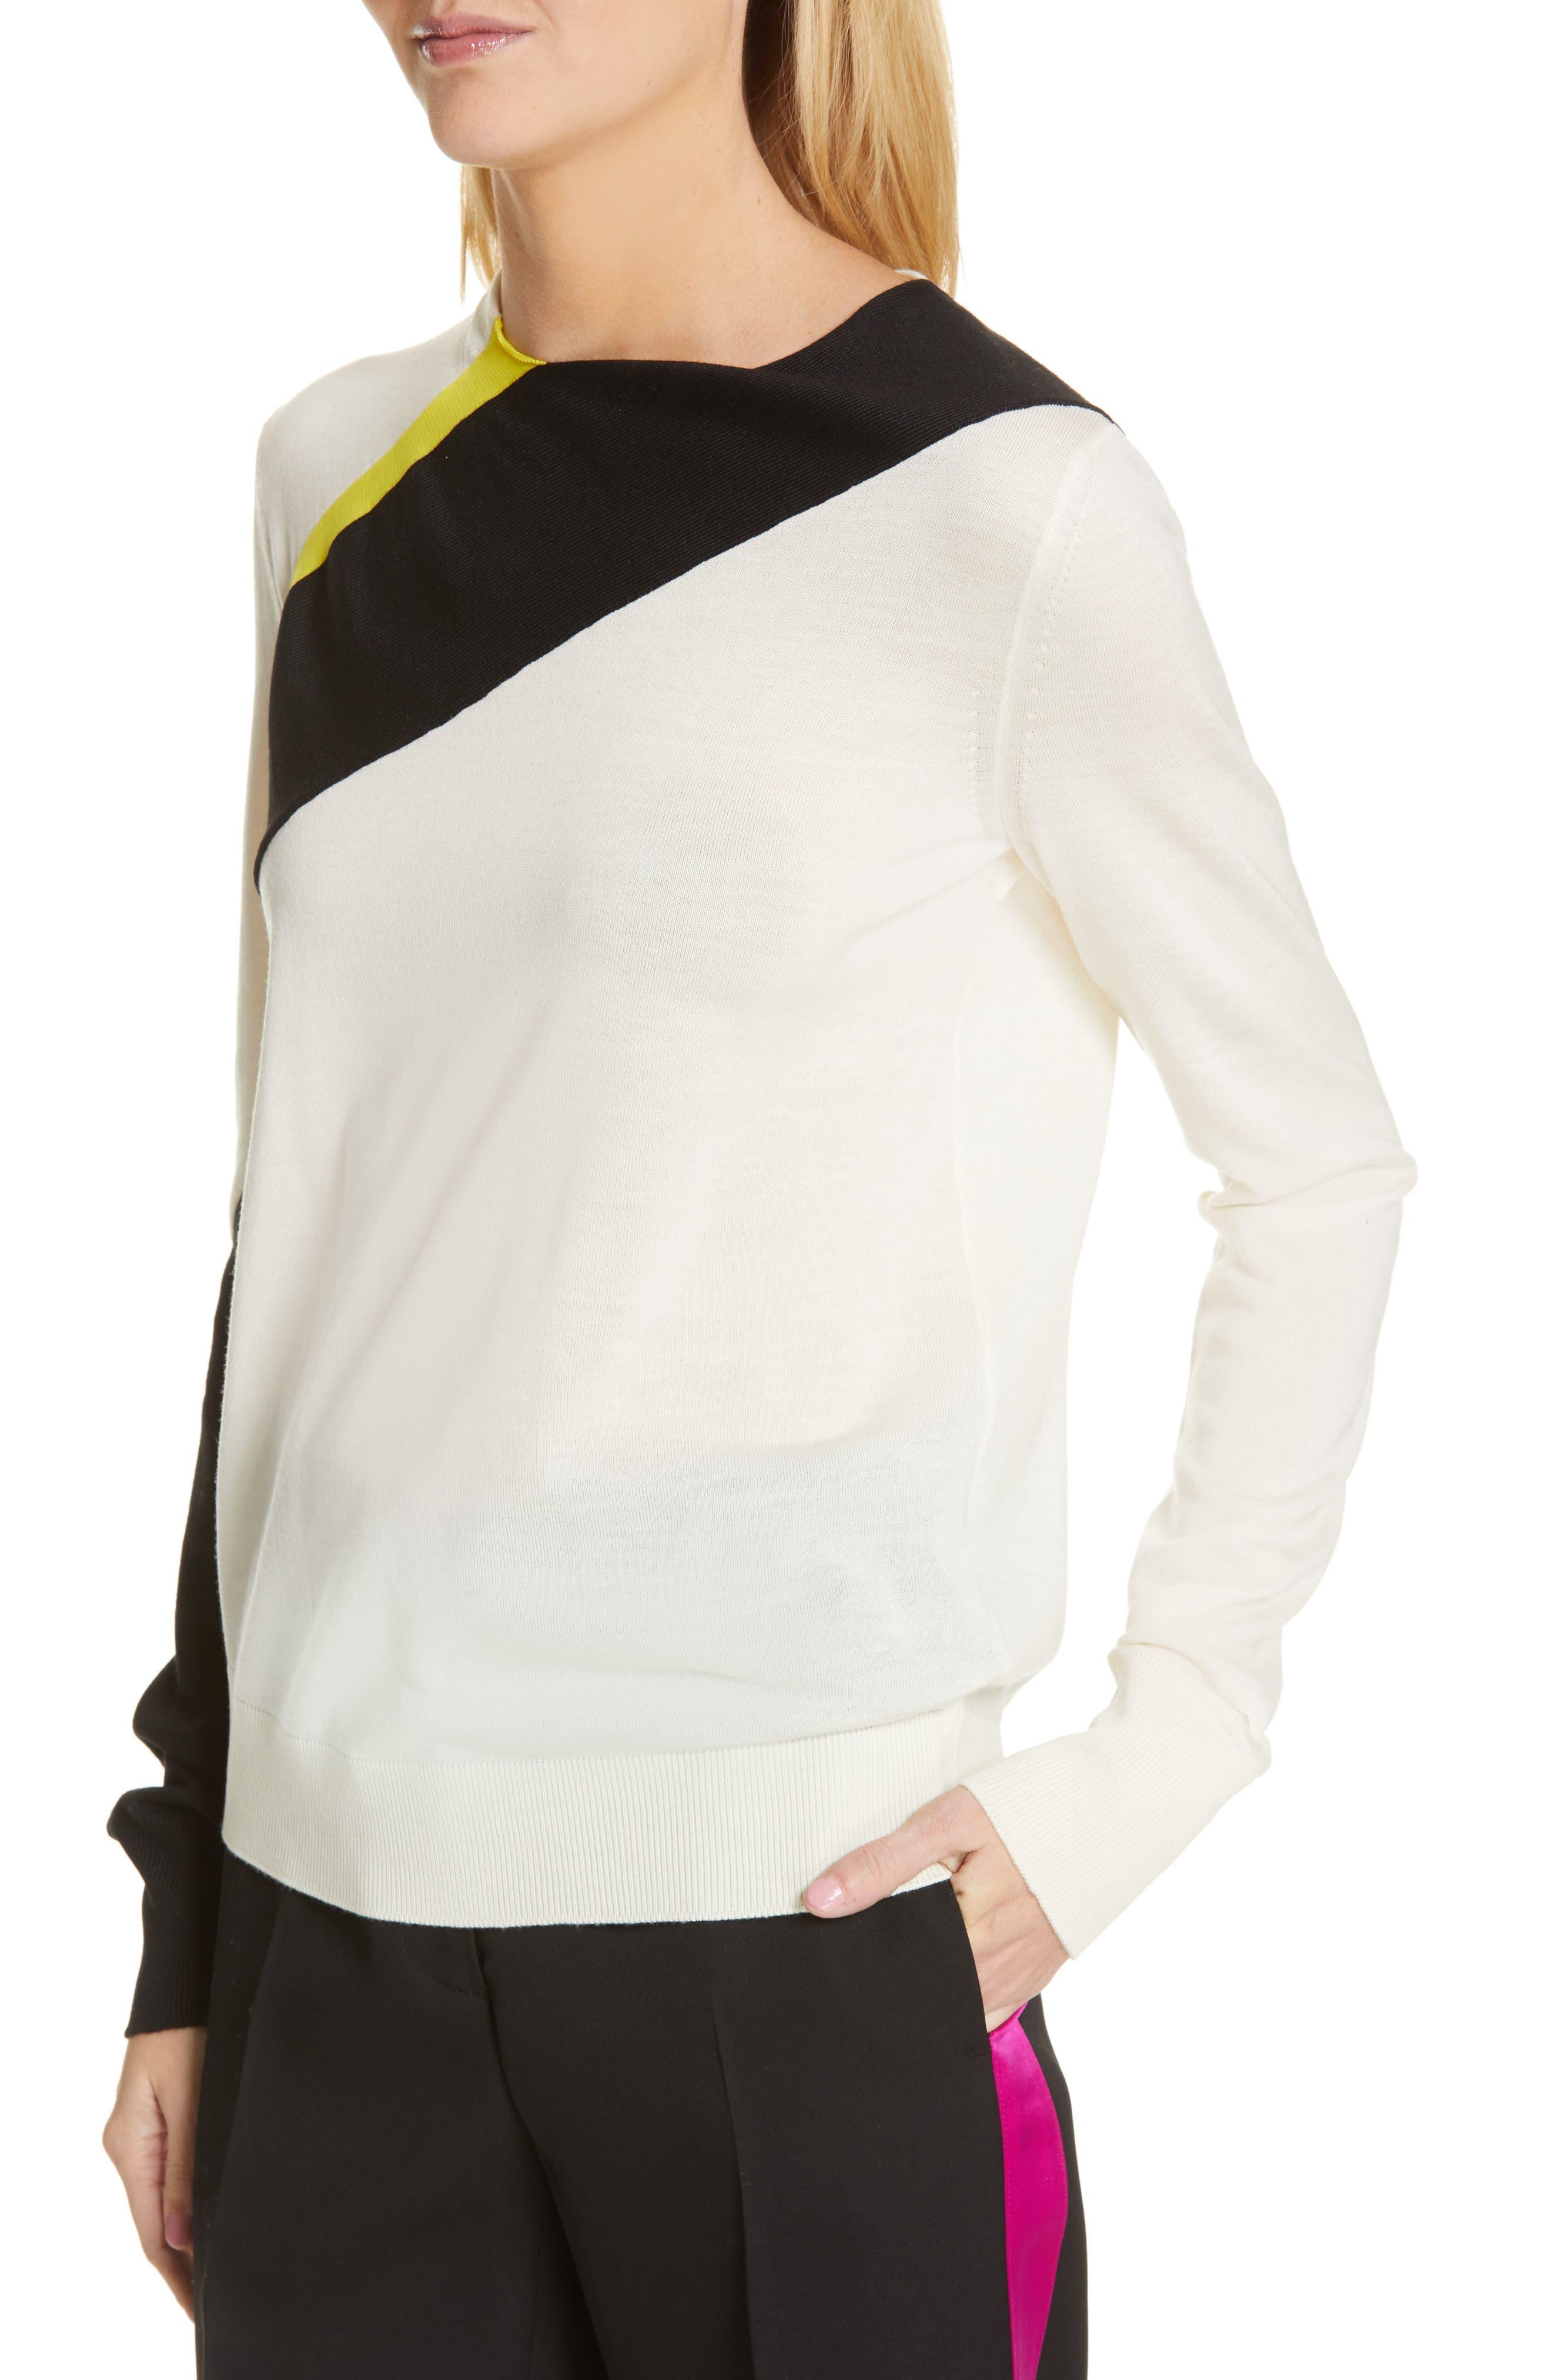 CALVIN KLEIN 205W39NYC, Contrast Stripe Wool Blend Sweater, Alternate thumbnail 5, color, WHITE BLACK TOURNESOL